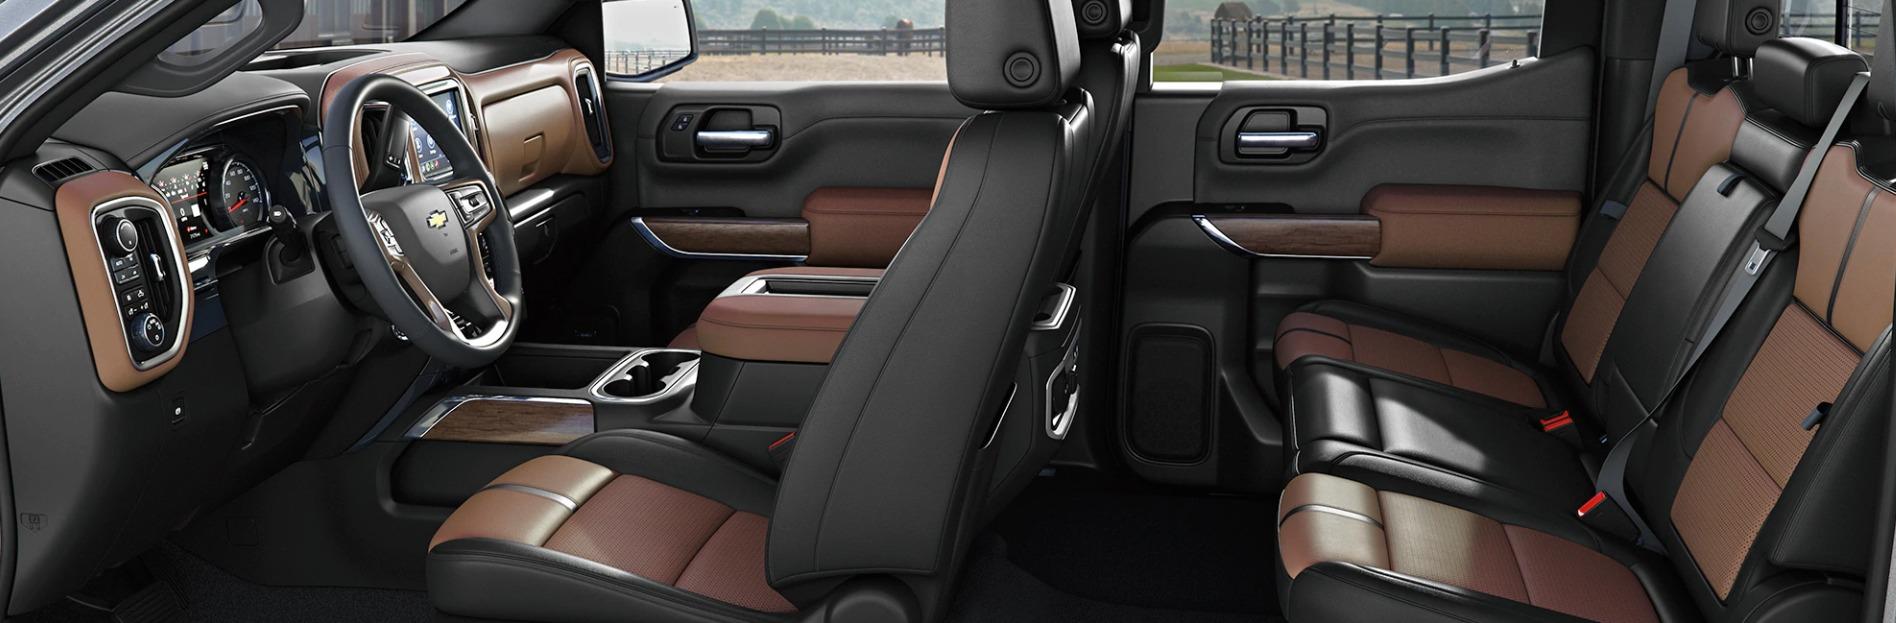 The Luxurious Interior of the 2020 Chevrolet Silverado 1500